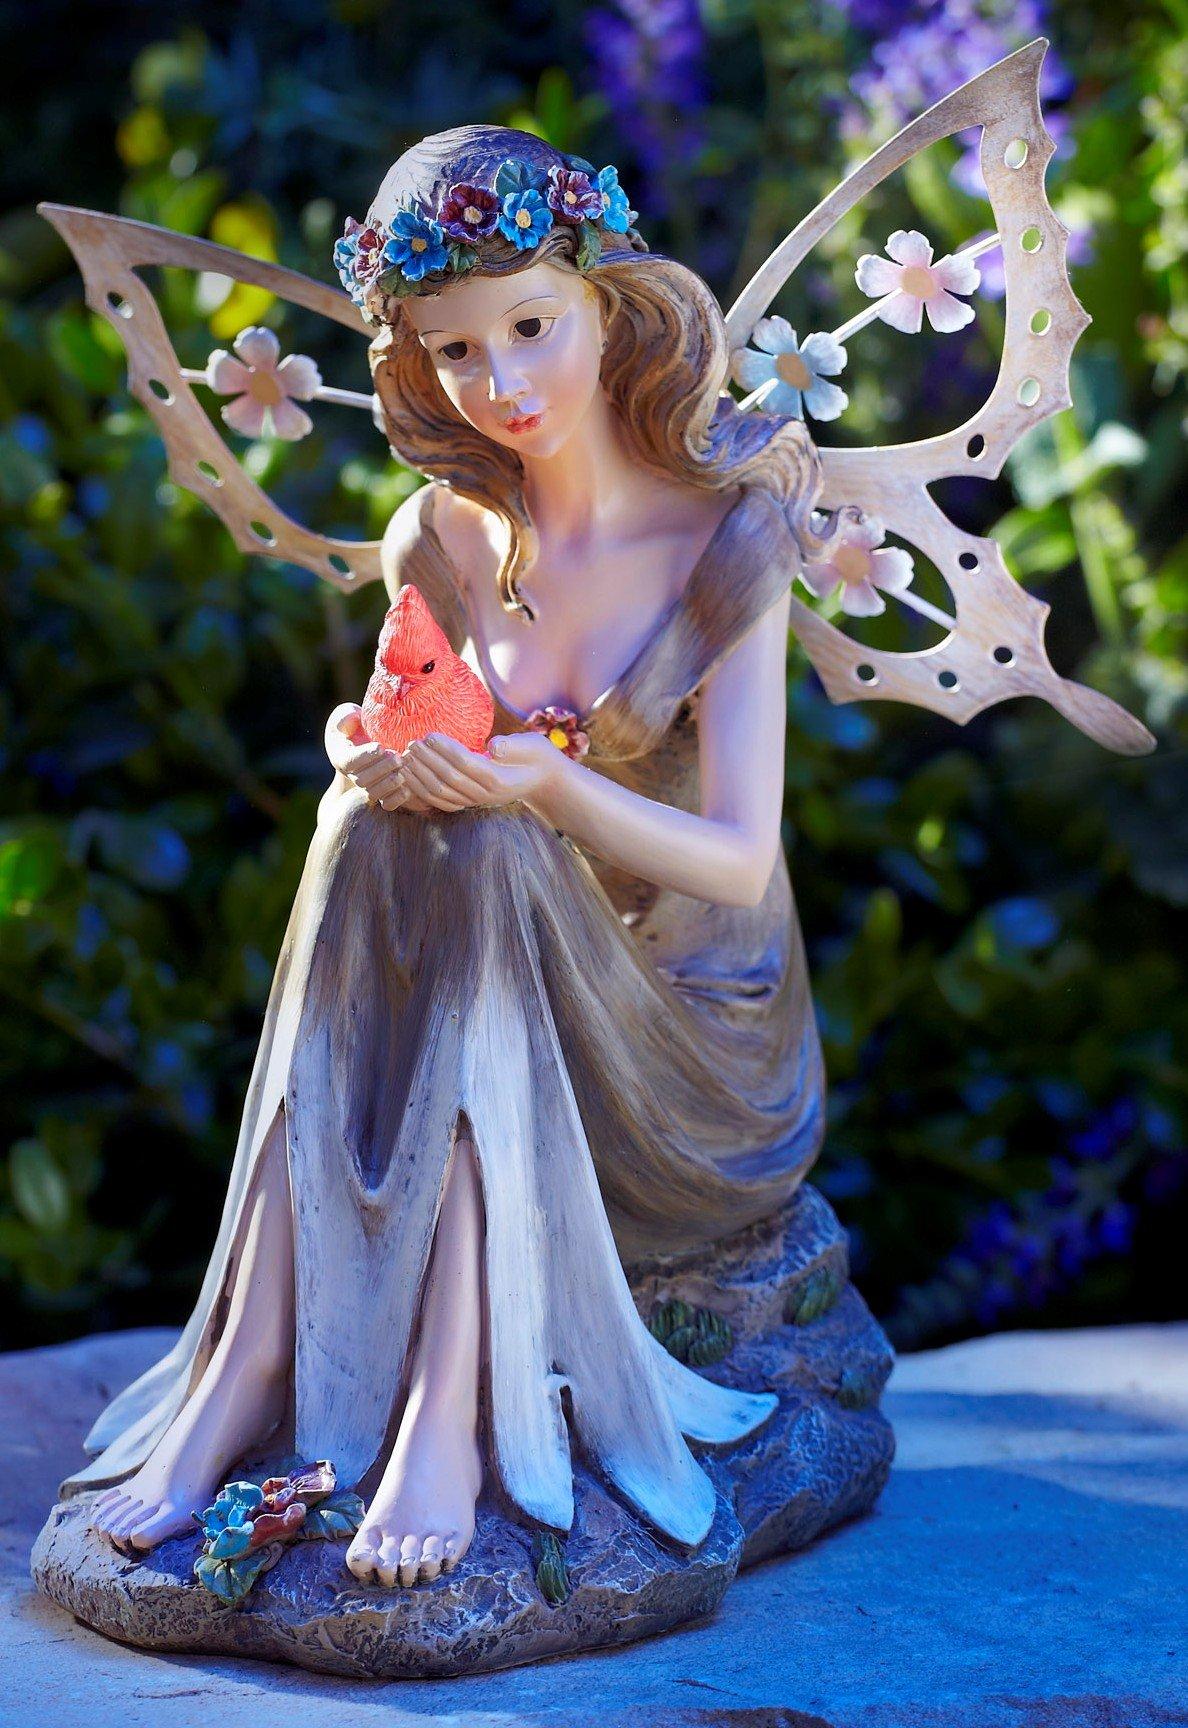 Moonrays 91351 Solar Powered Garden Fairy with Glowing Cardinal by Moonrays (Image #2)